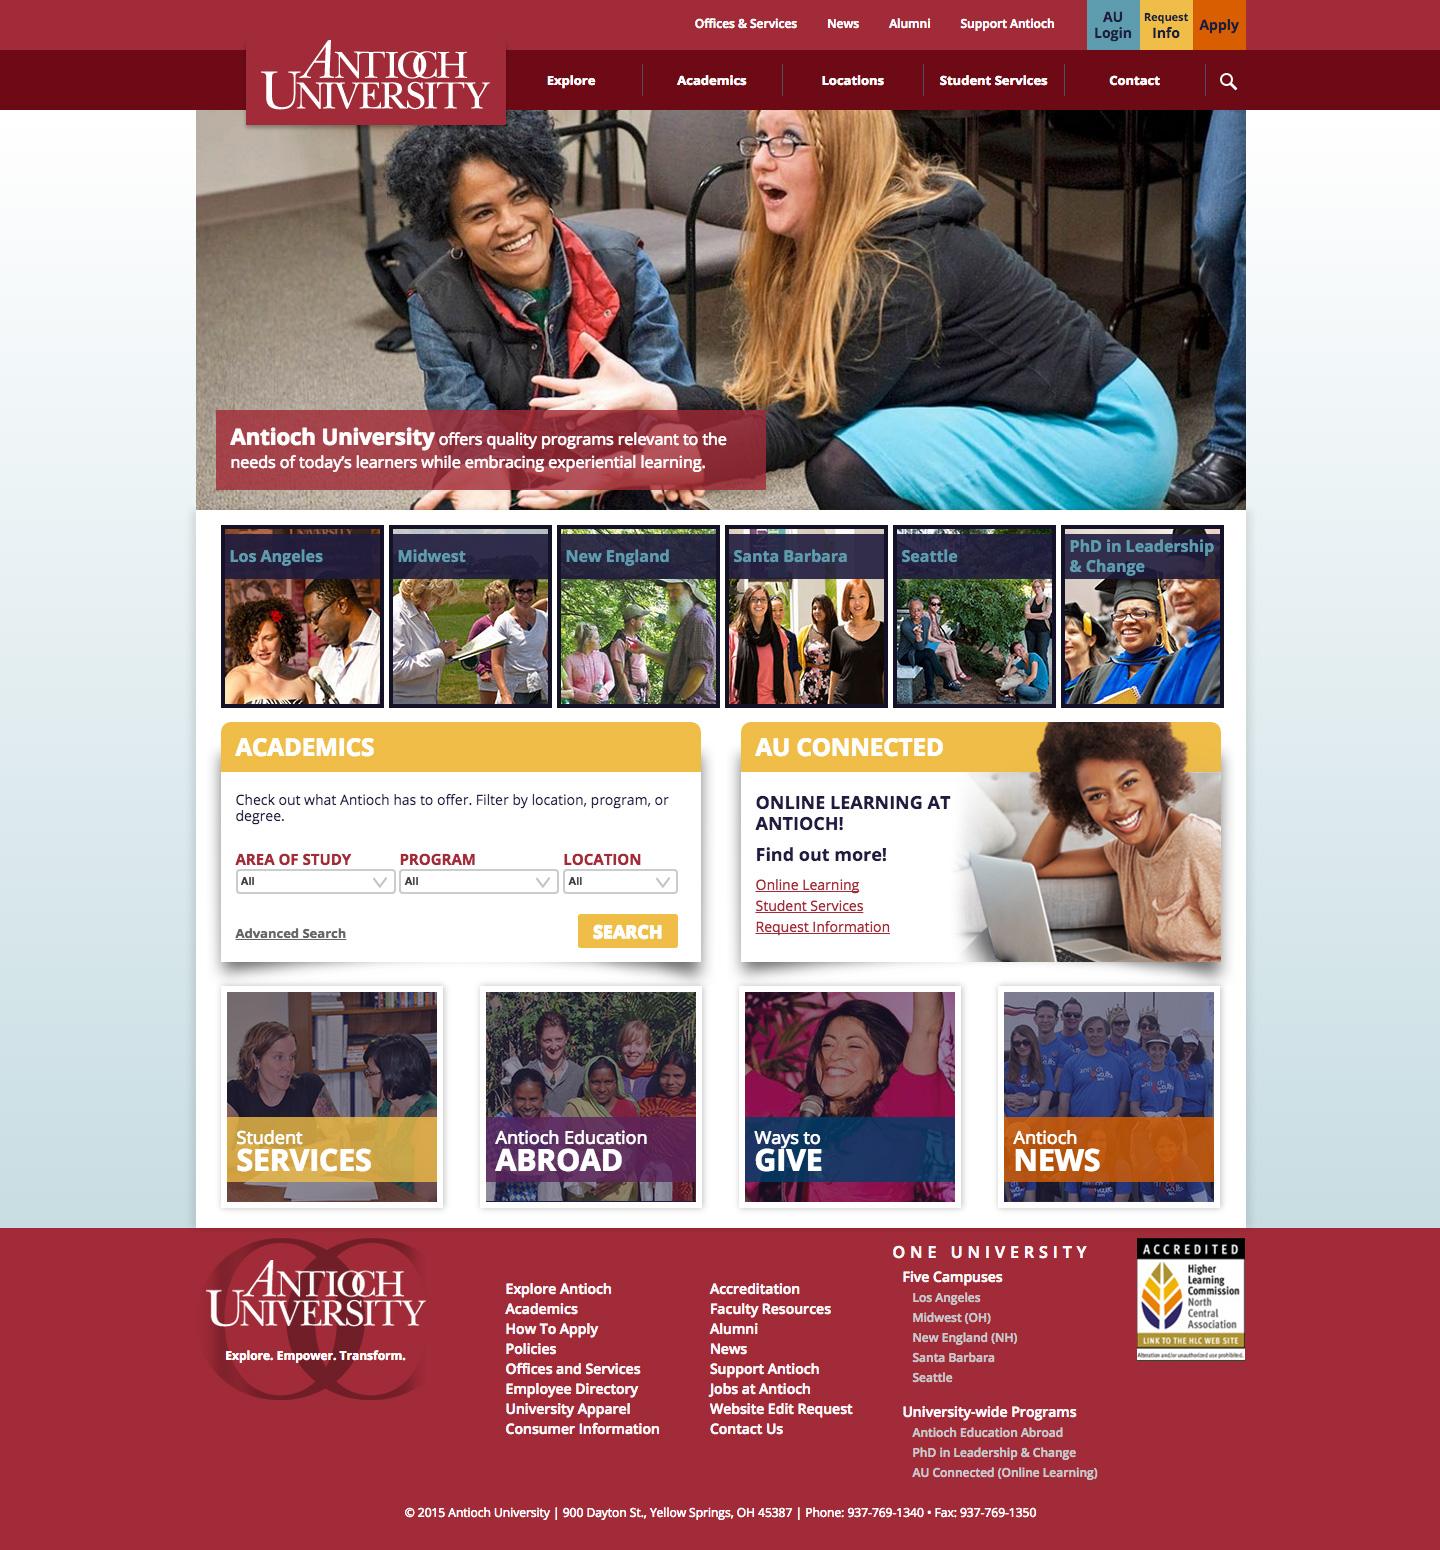 Antioch University website built by Aquatic in San Francisco